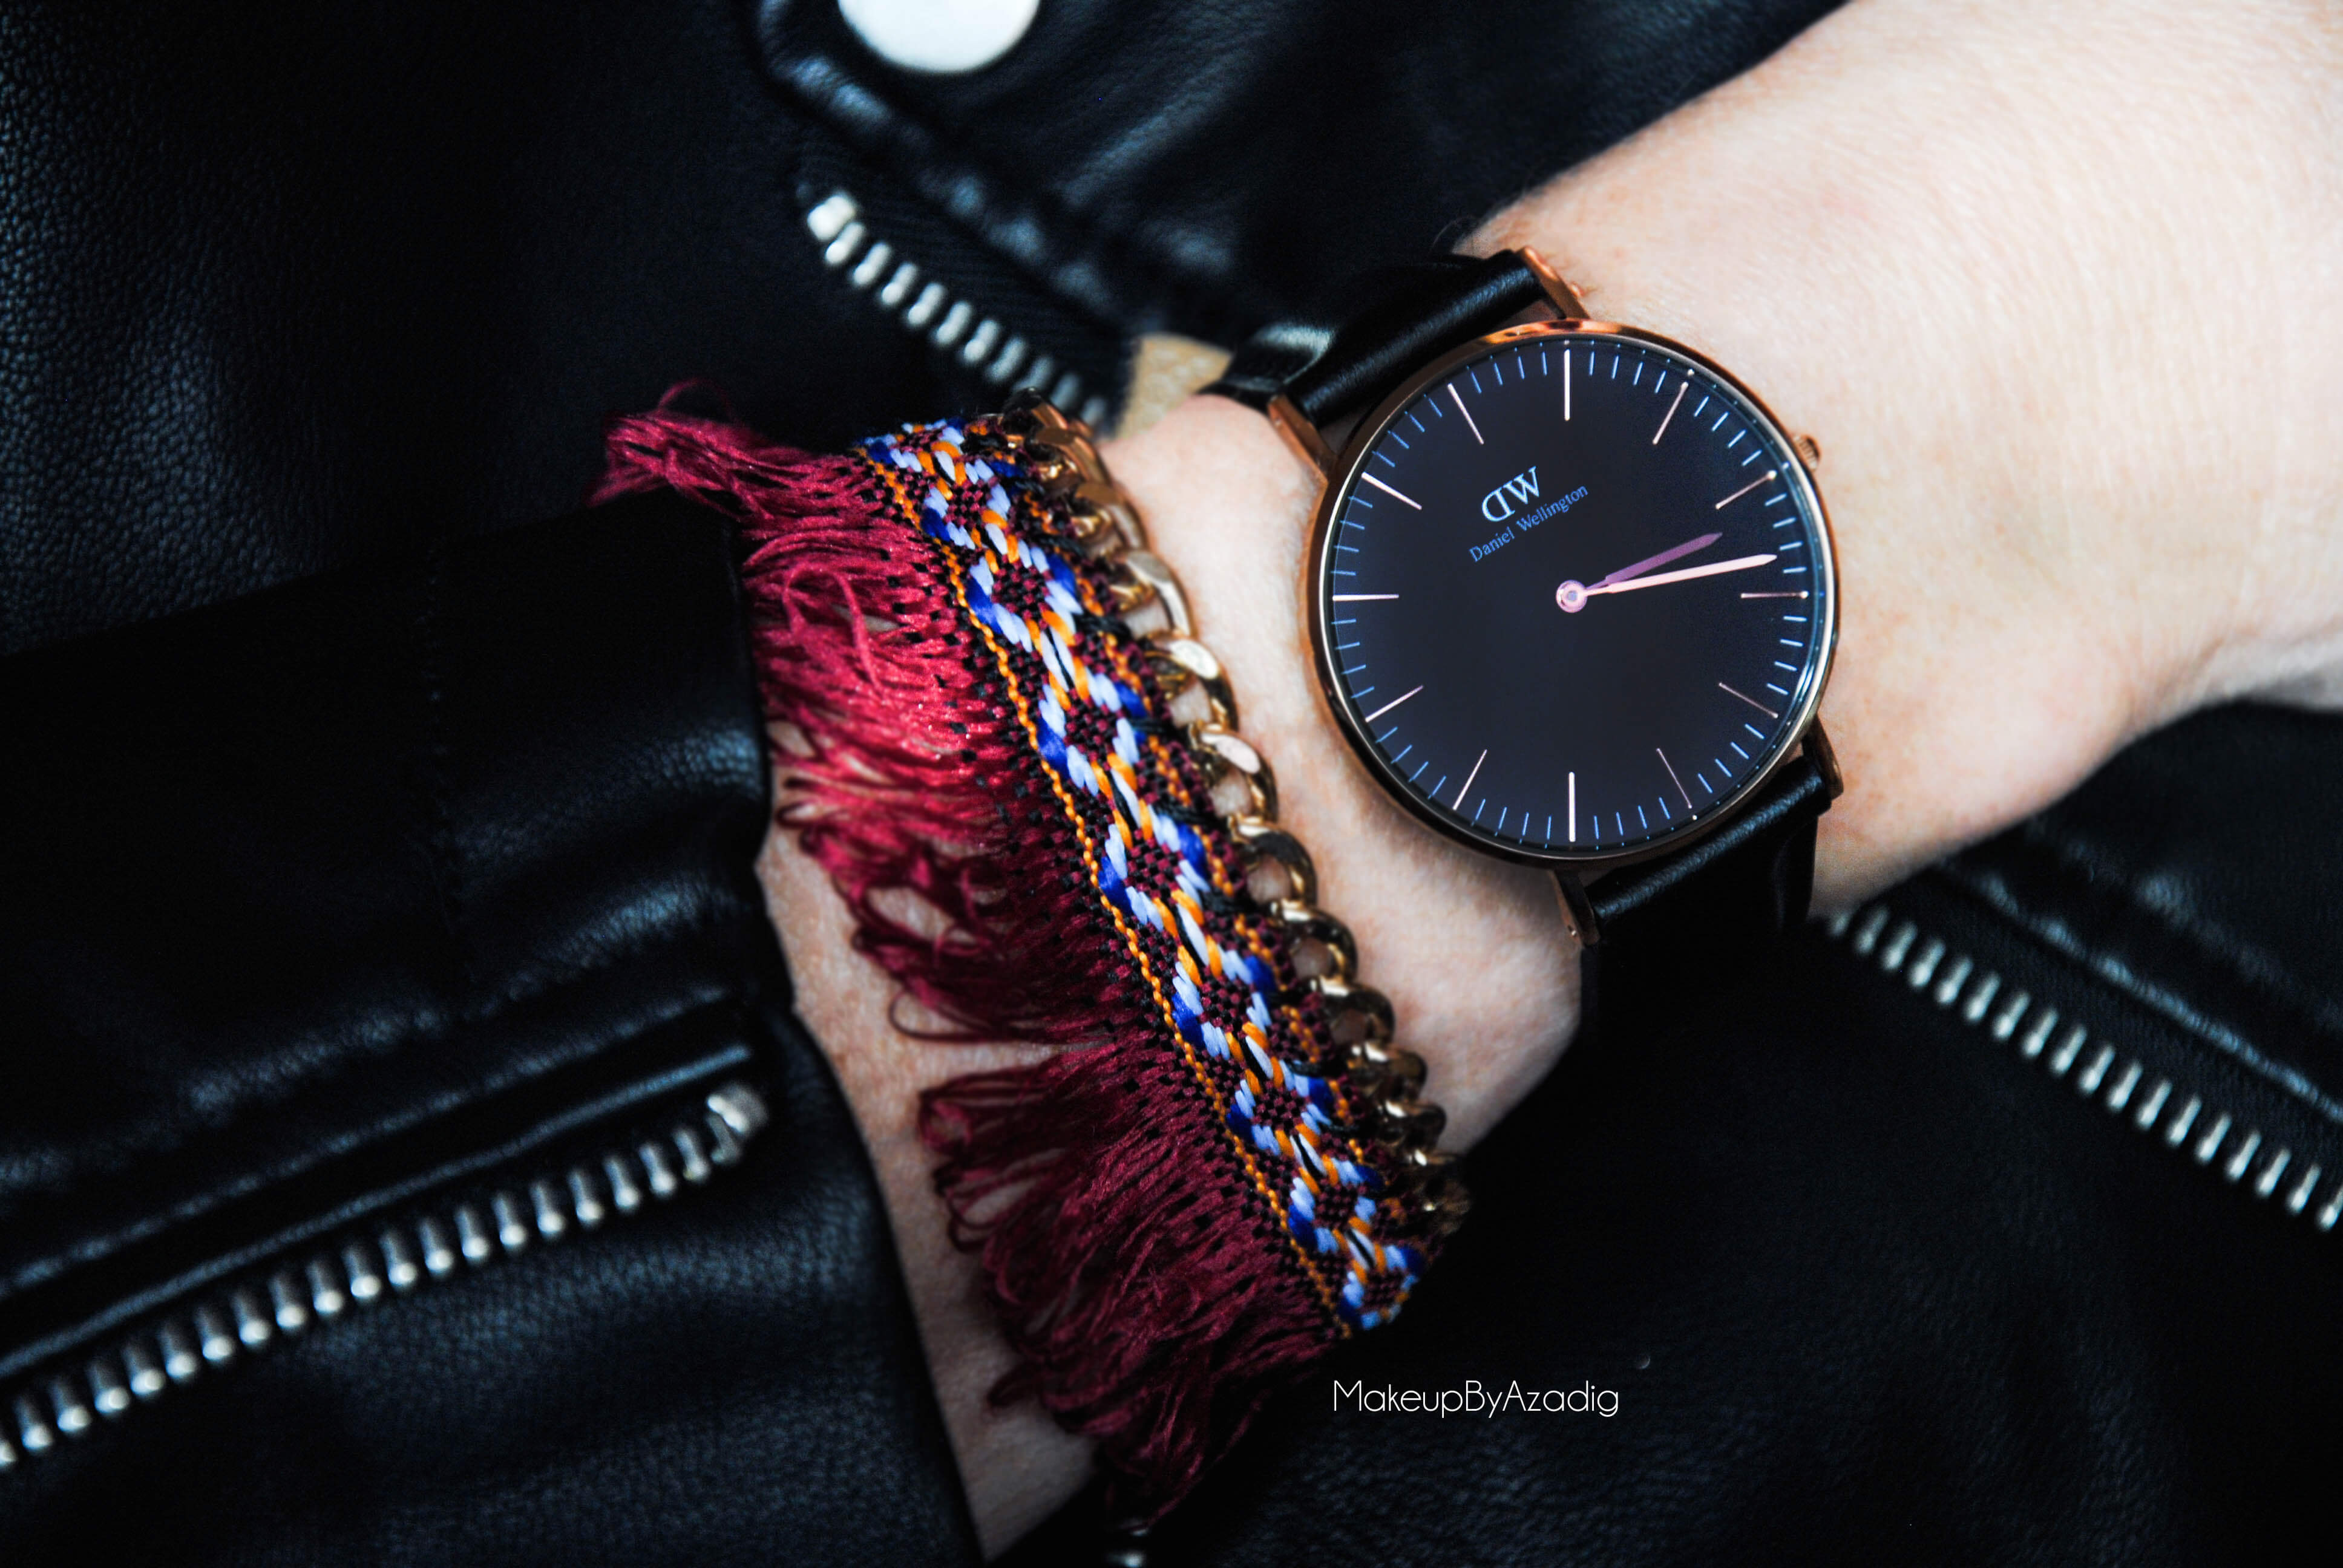 makeupbyazadig-daniel-wellington-montre-classic-black-sheffield-code-promo-troyes-paris-swatch